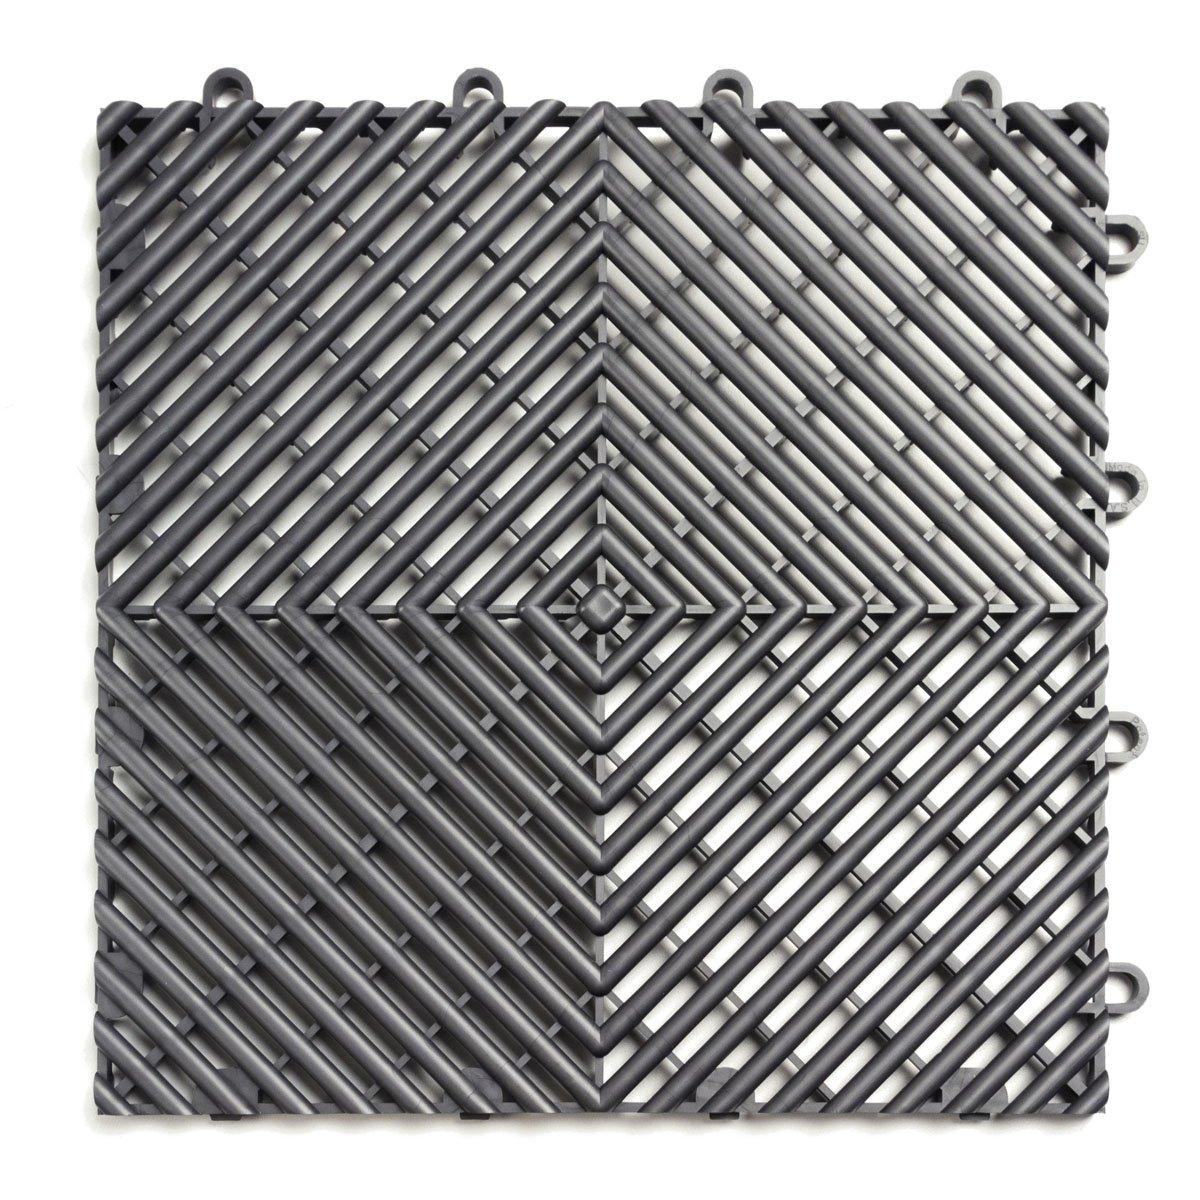 RaceDeck Free-Flow Open Rib Design, Durable Interlocking Modular Garage Flooring Tile (12 Pack), Graphite